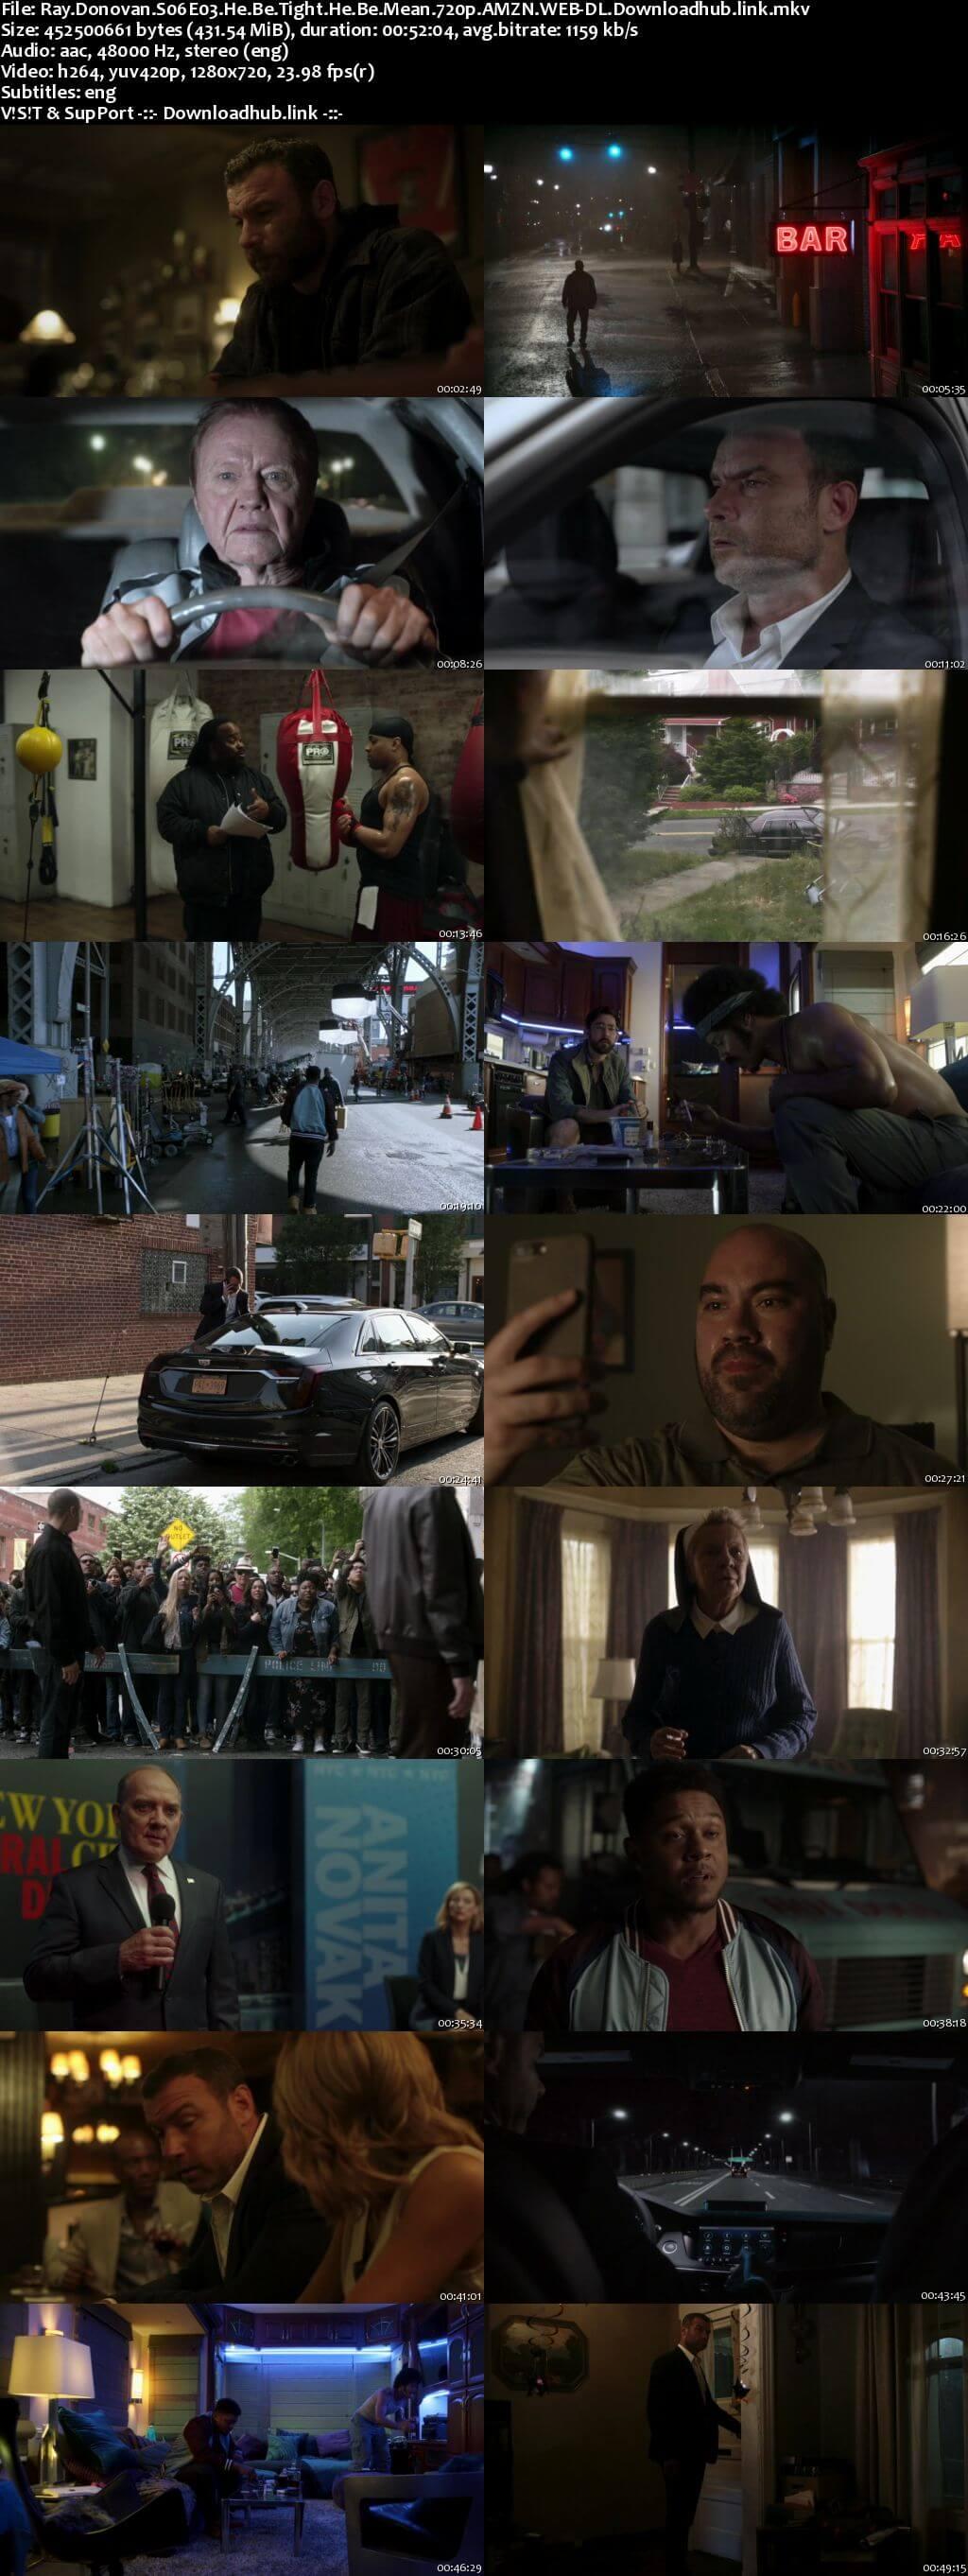 Ray Donovan S06E03 400MB AMZN WEB-DL 720p ESubs